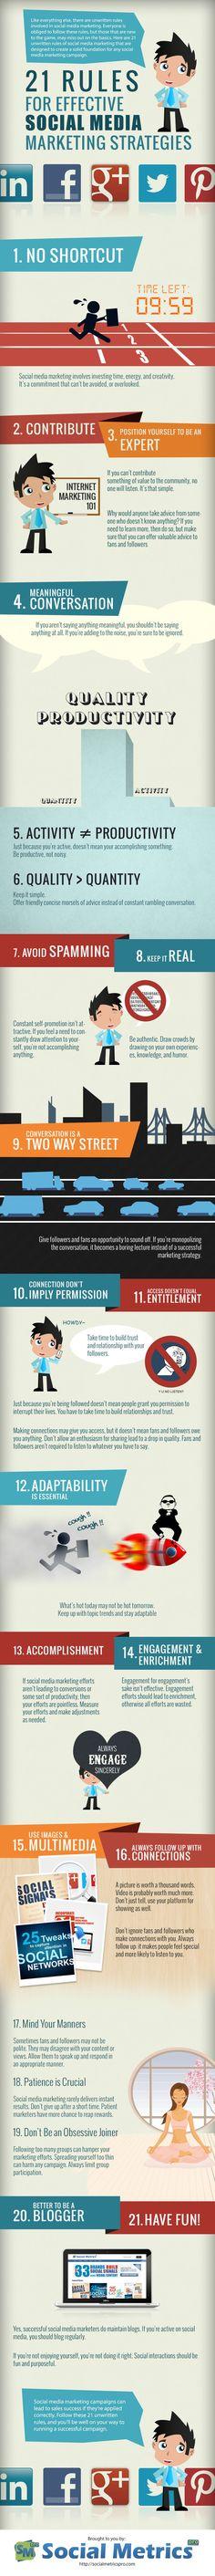 The 21 Rules of Social Media Marketing